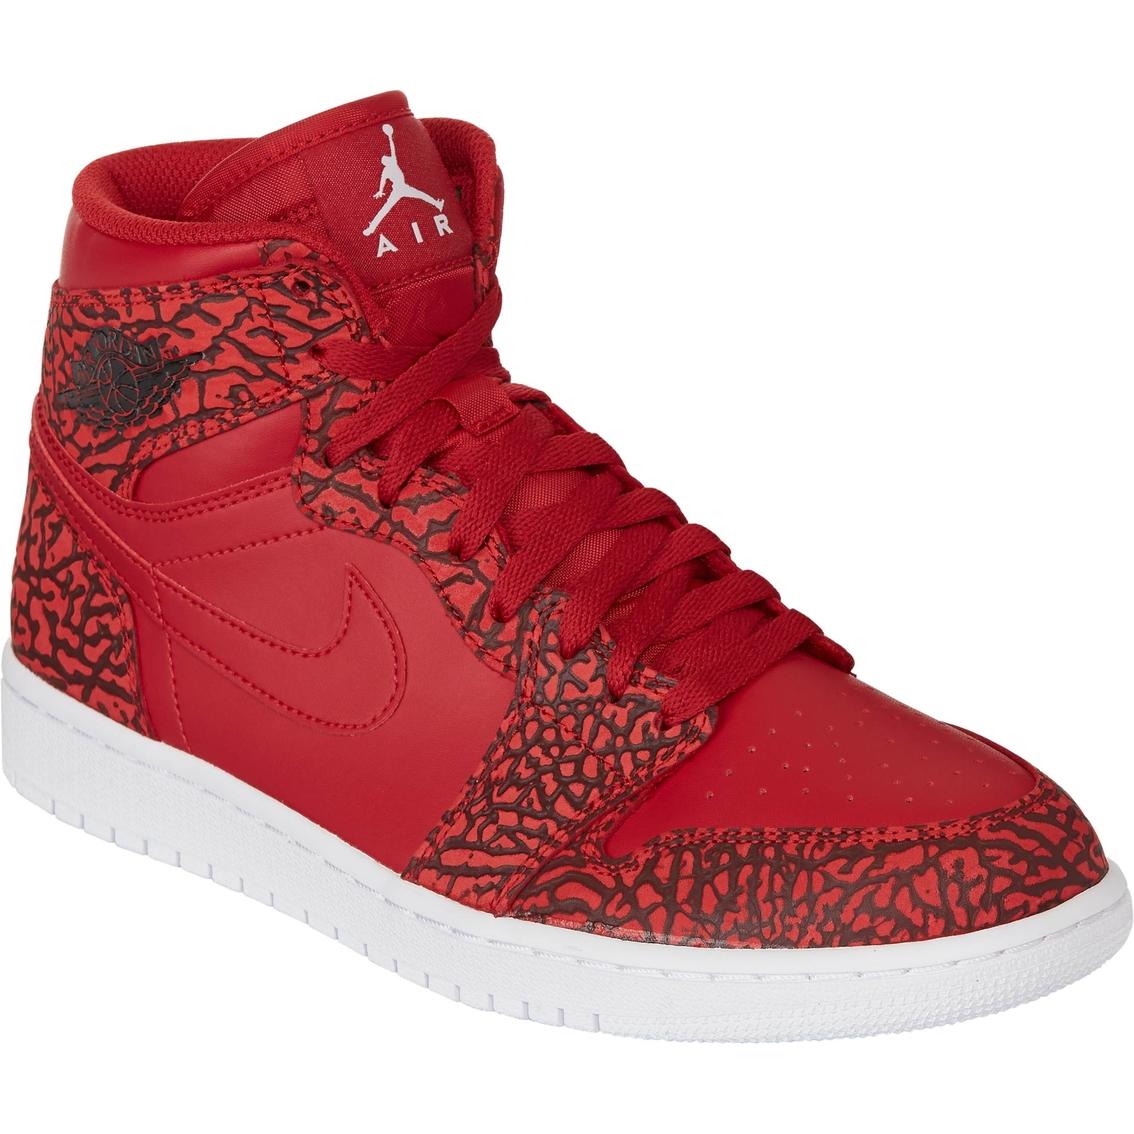 80f7c067b04799 Air Jordan Men s 1 Retro High Basketball Shoes